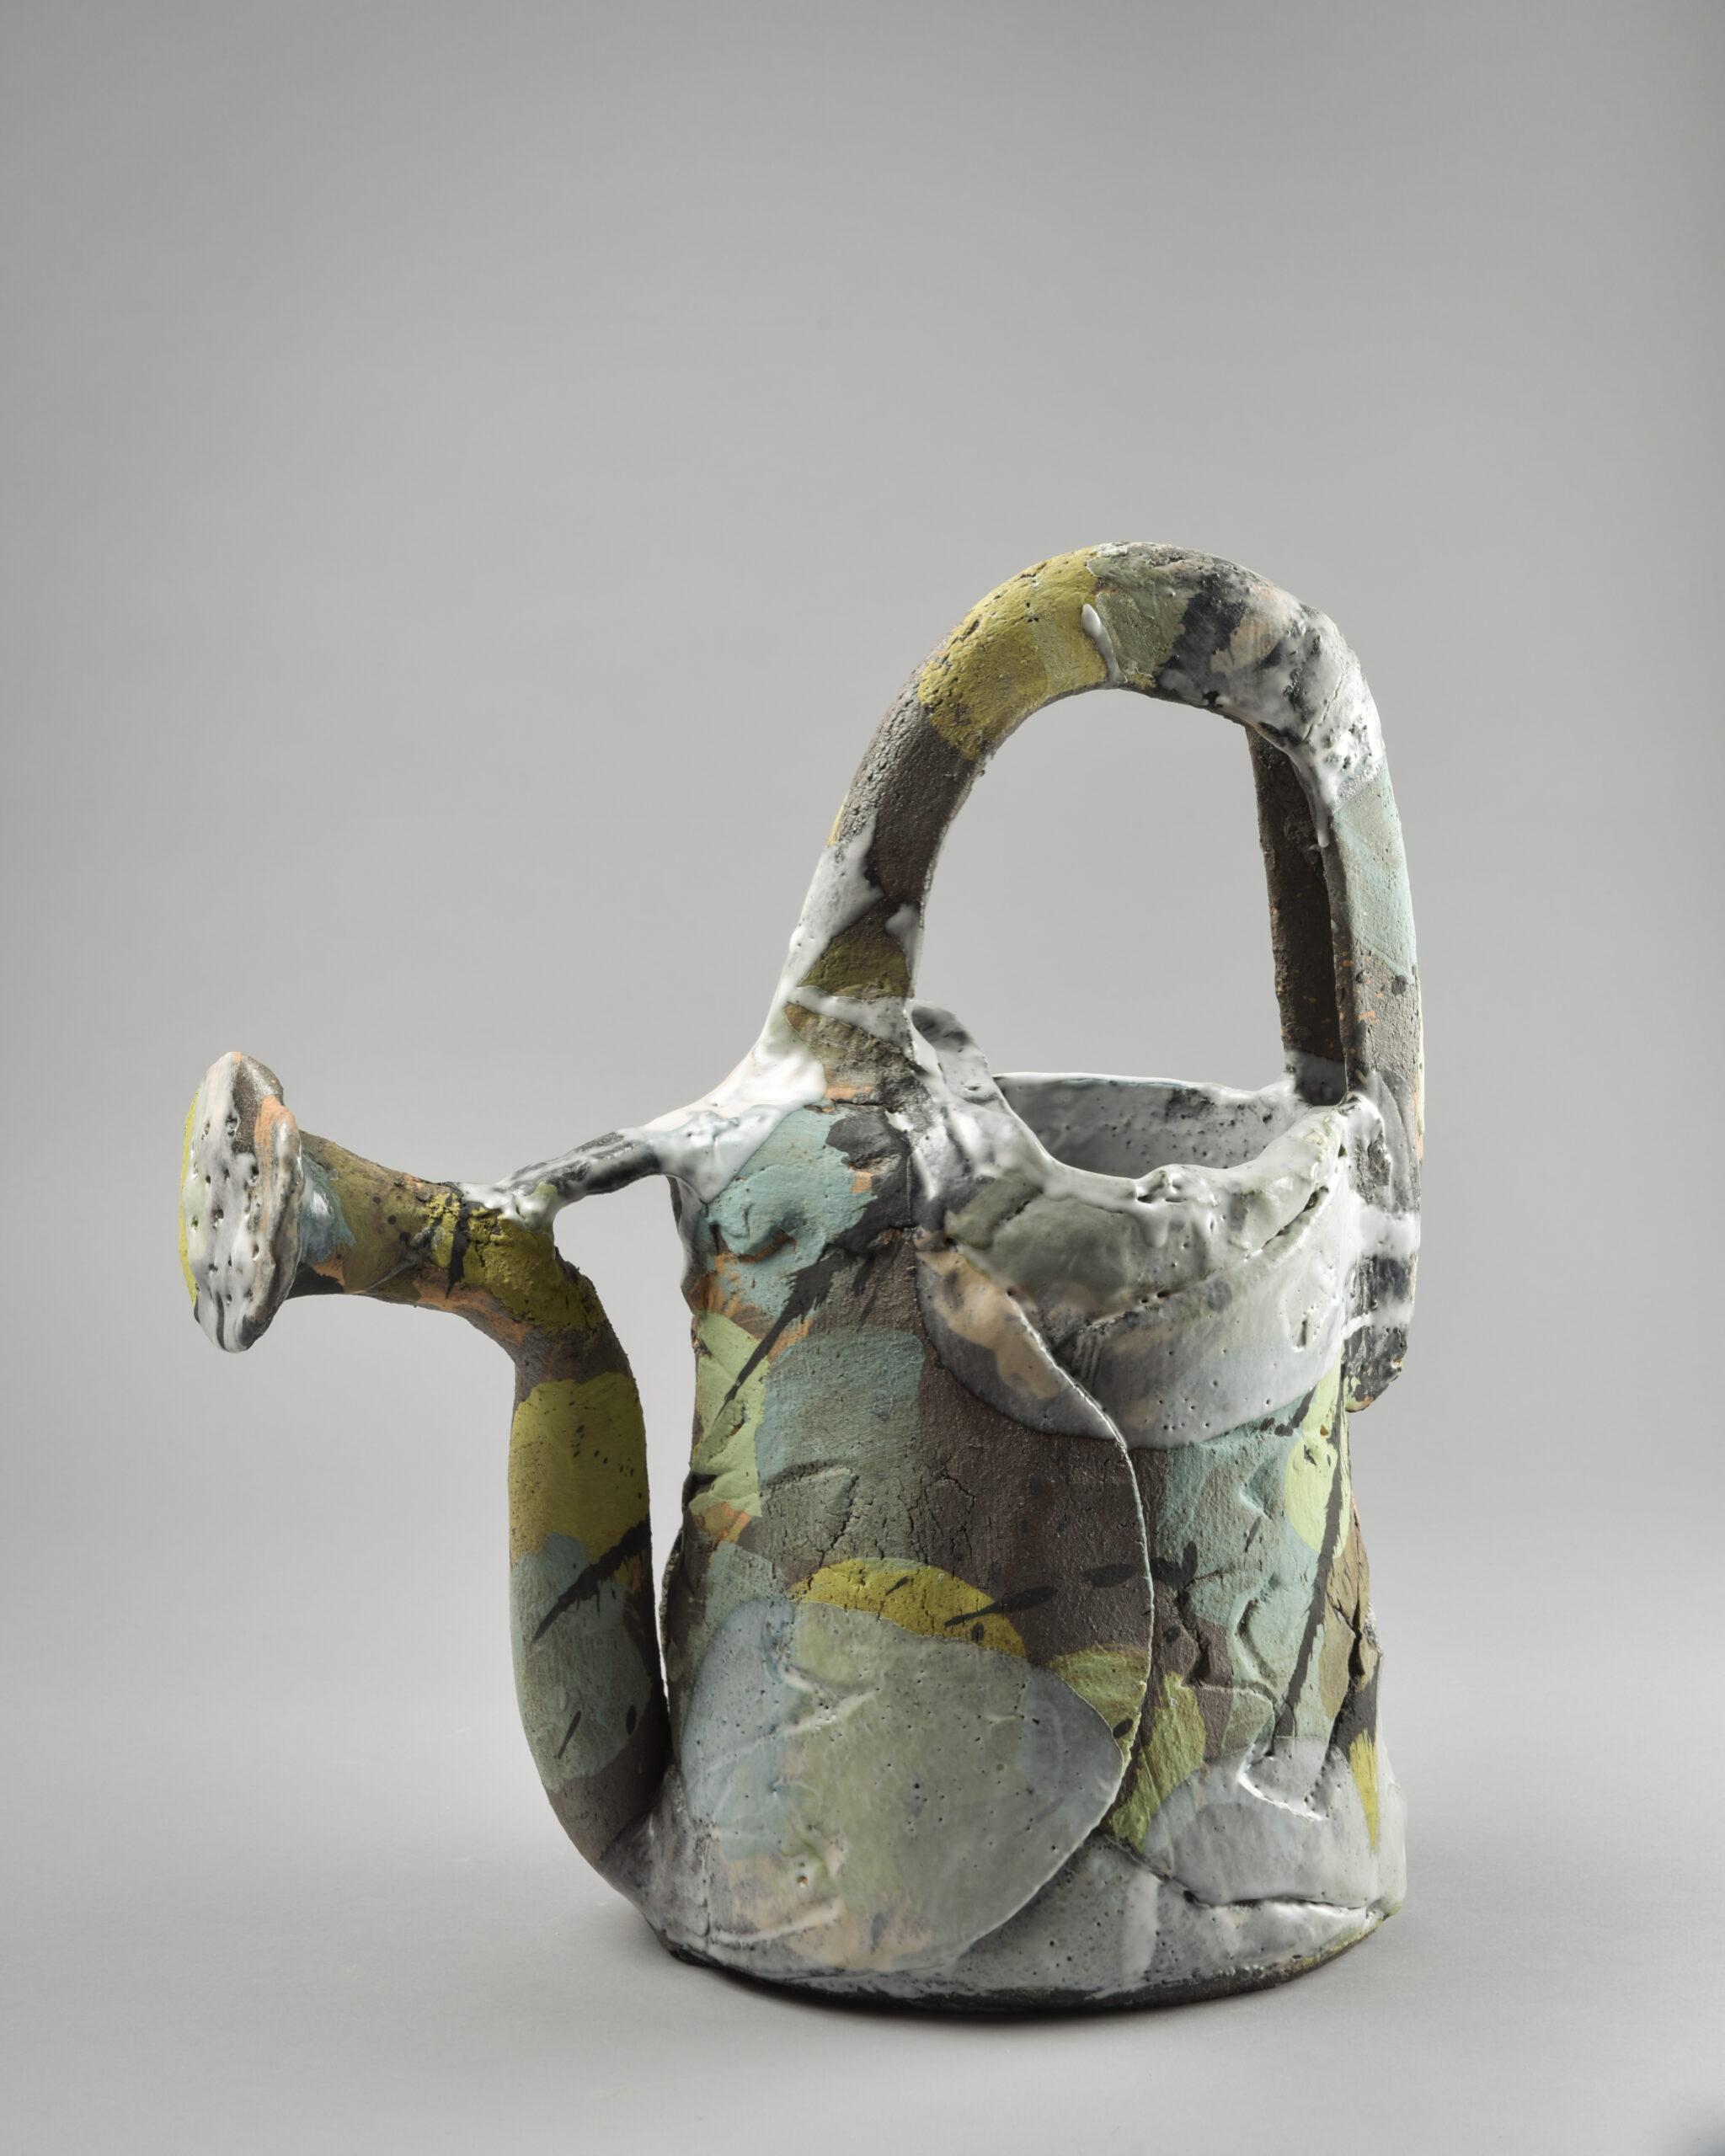 Arrosoir 45 cm scaled | Françoise Nugier | Françoise Nugier | Atelier | Terre et Terres | 25 avril 2019